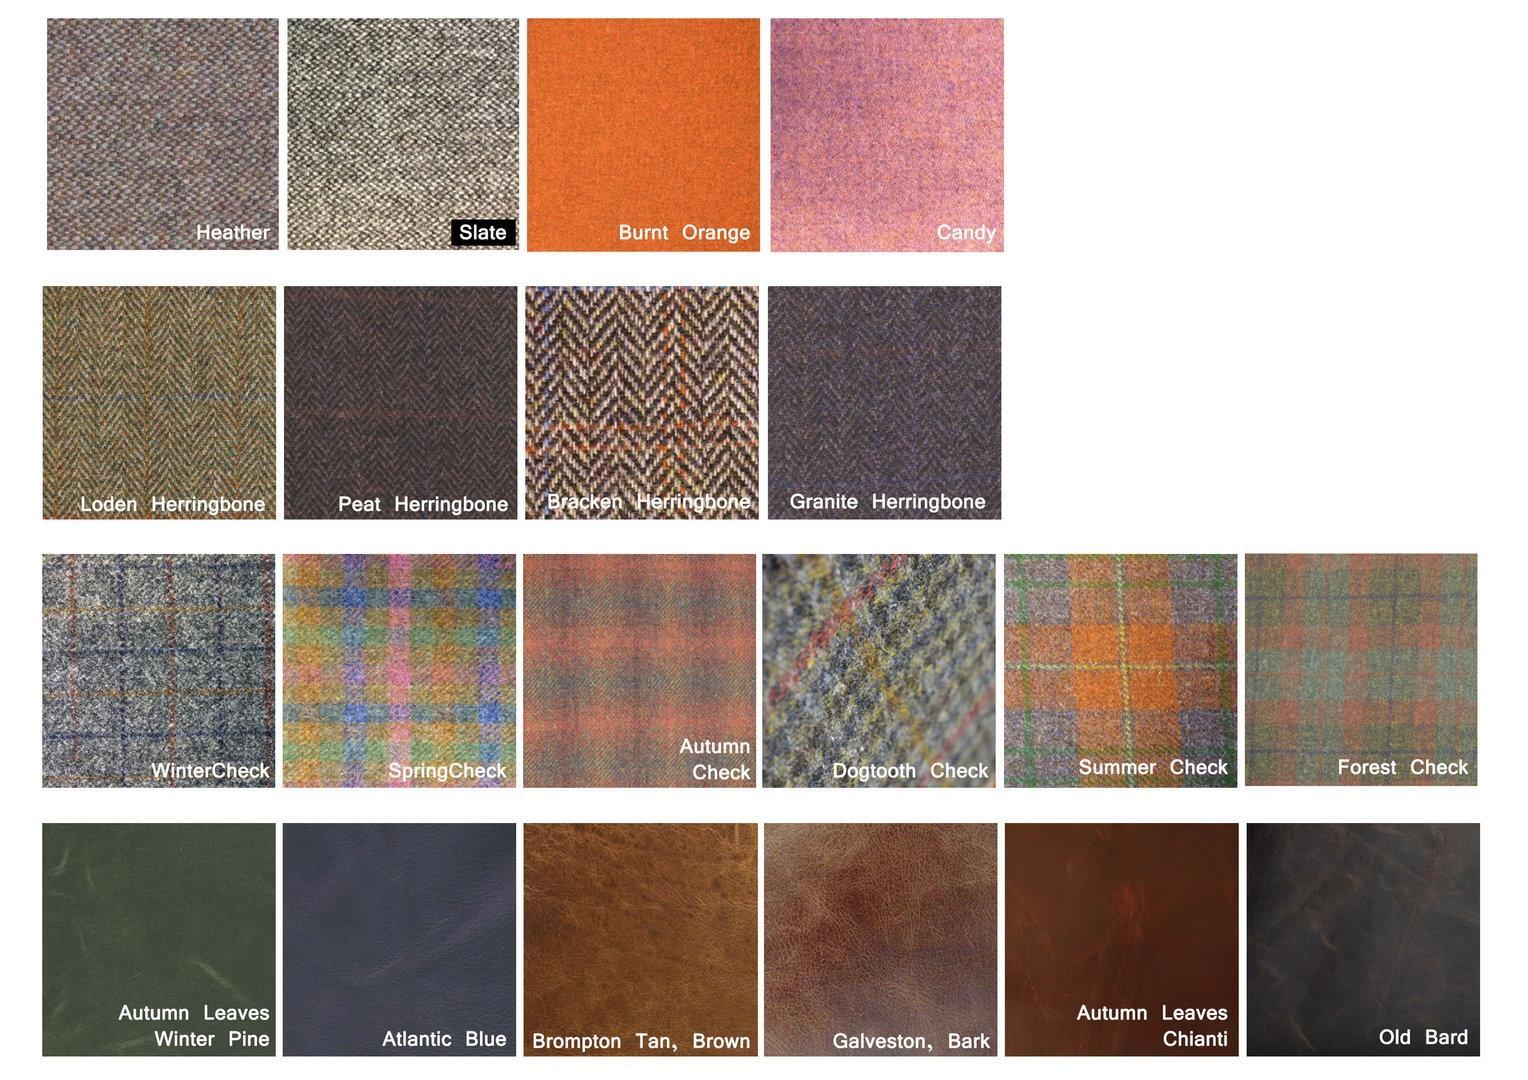 Leather Sofa Sets | Tehranmix Decoration Inside Tweed Fabric Sofas (Image 8 of 20)